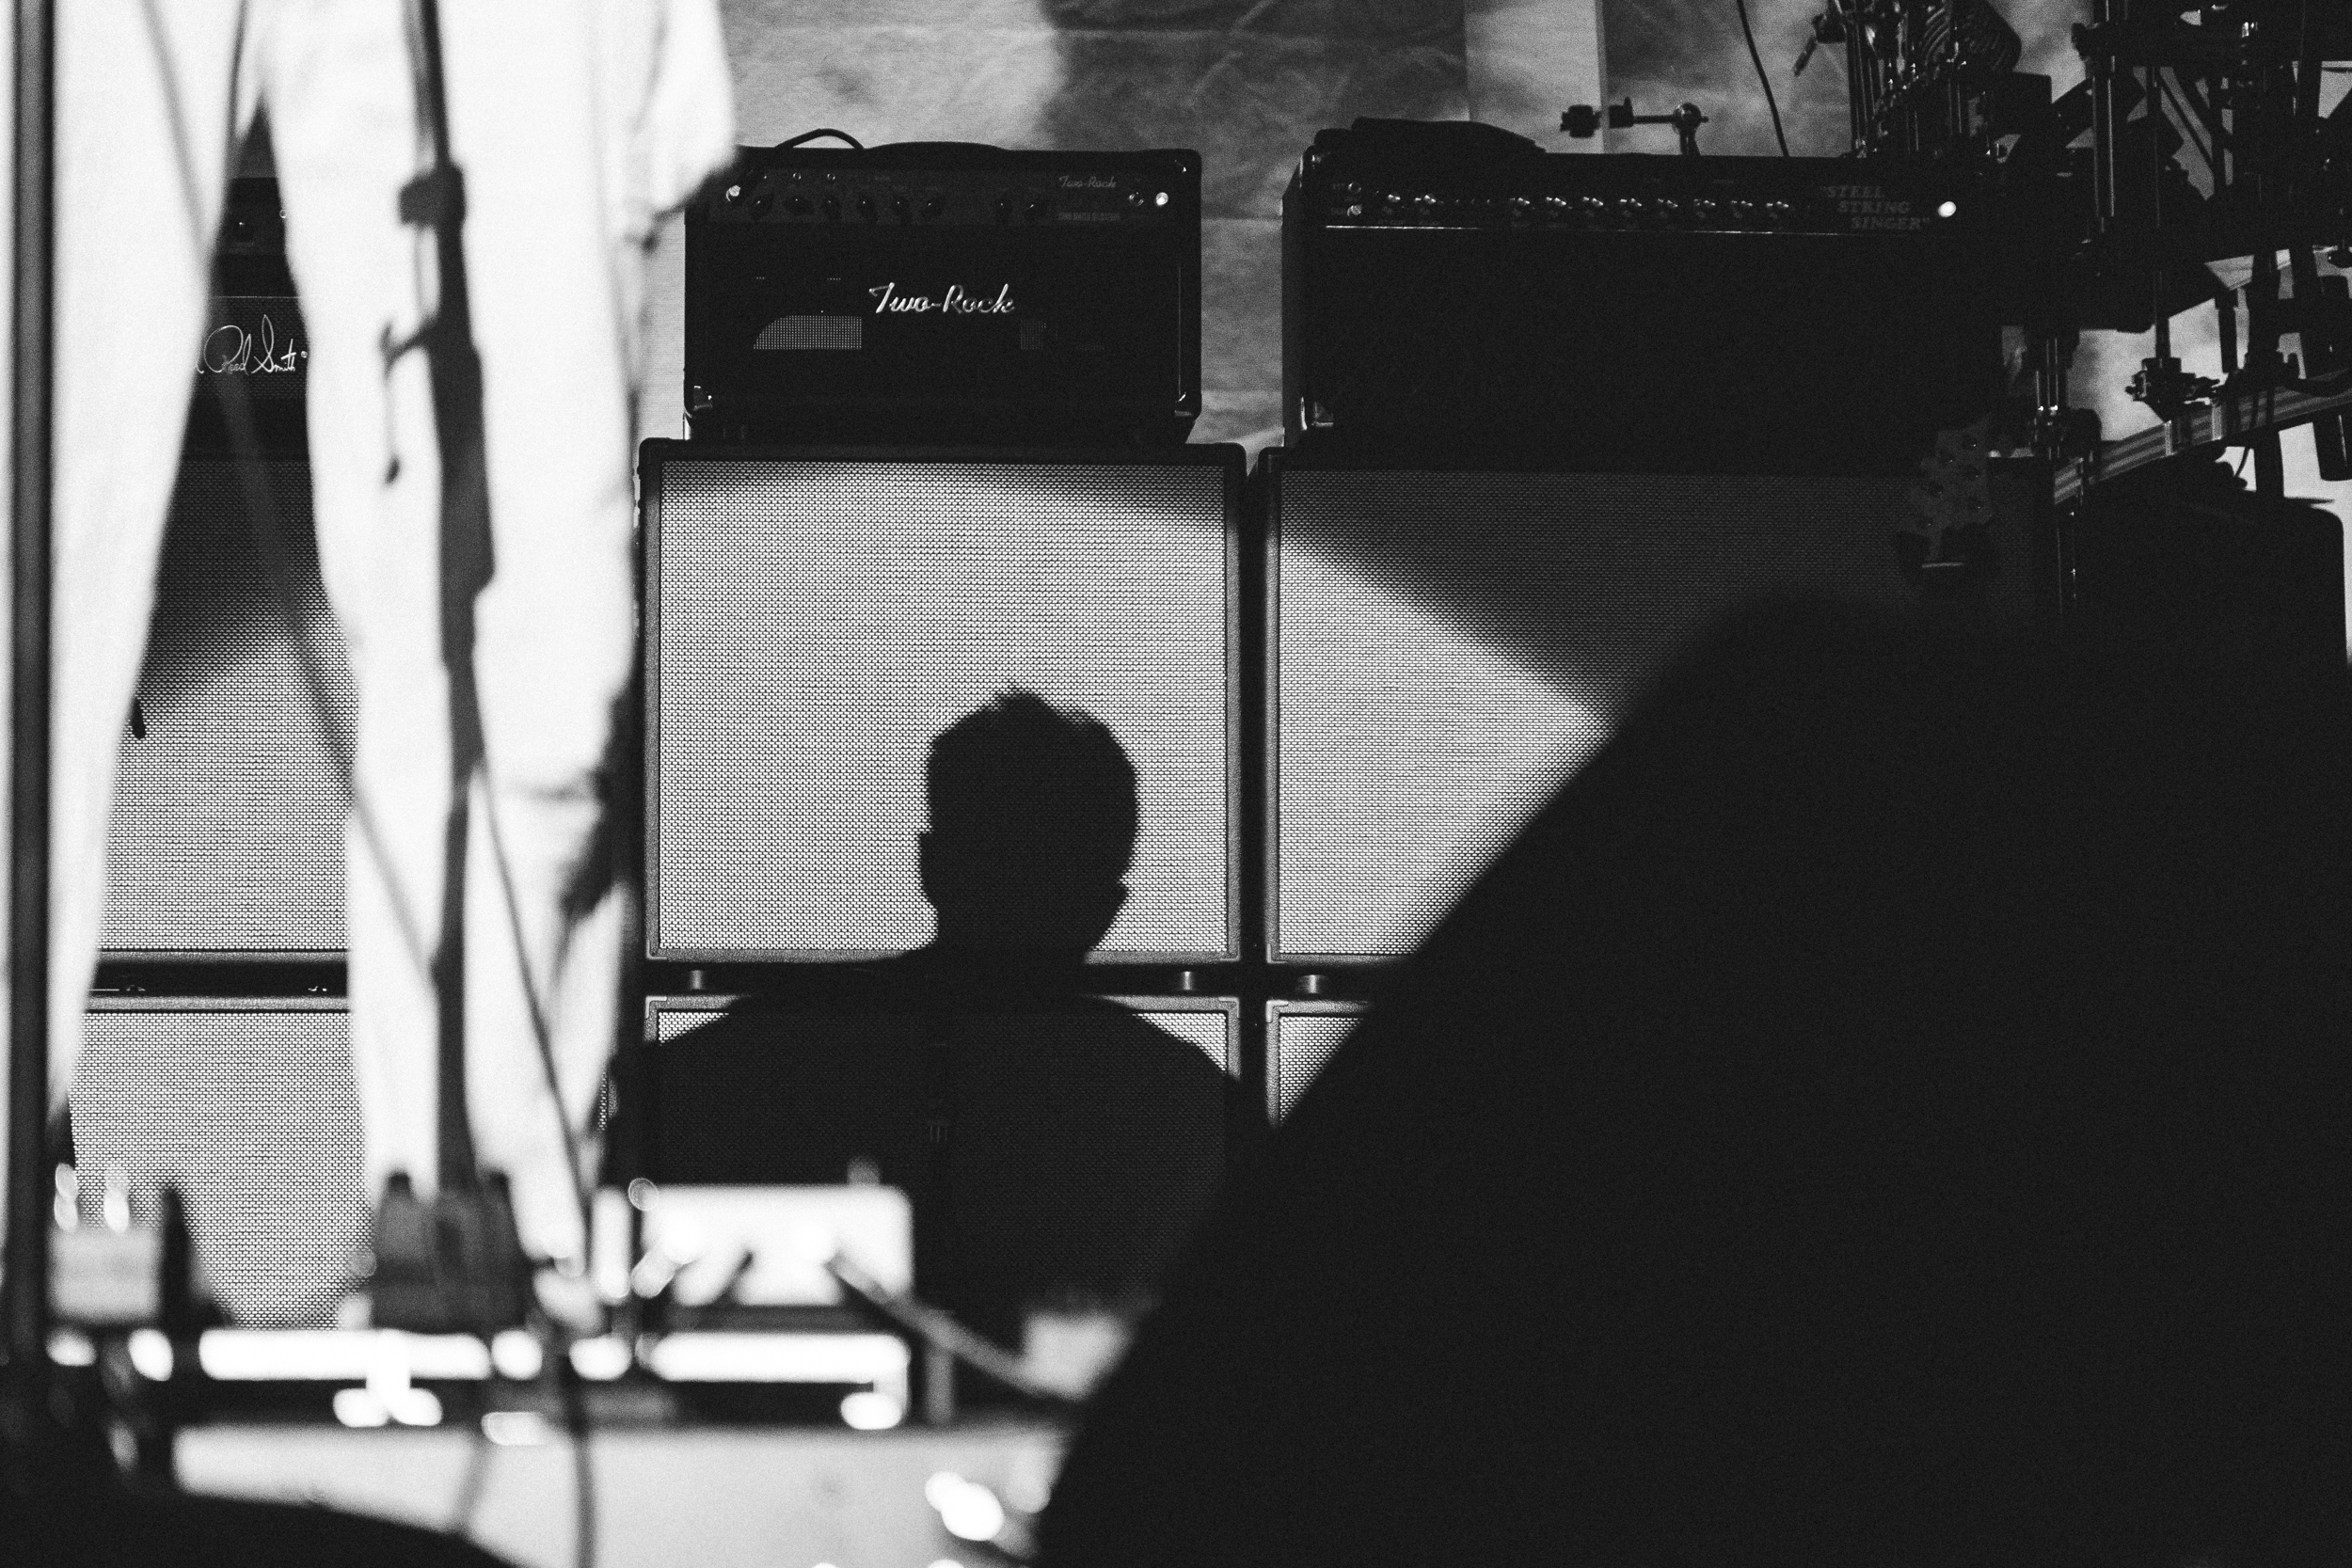 John Mayer-Rod_Laver-1095.jpg